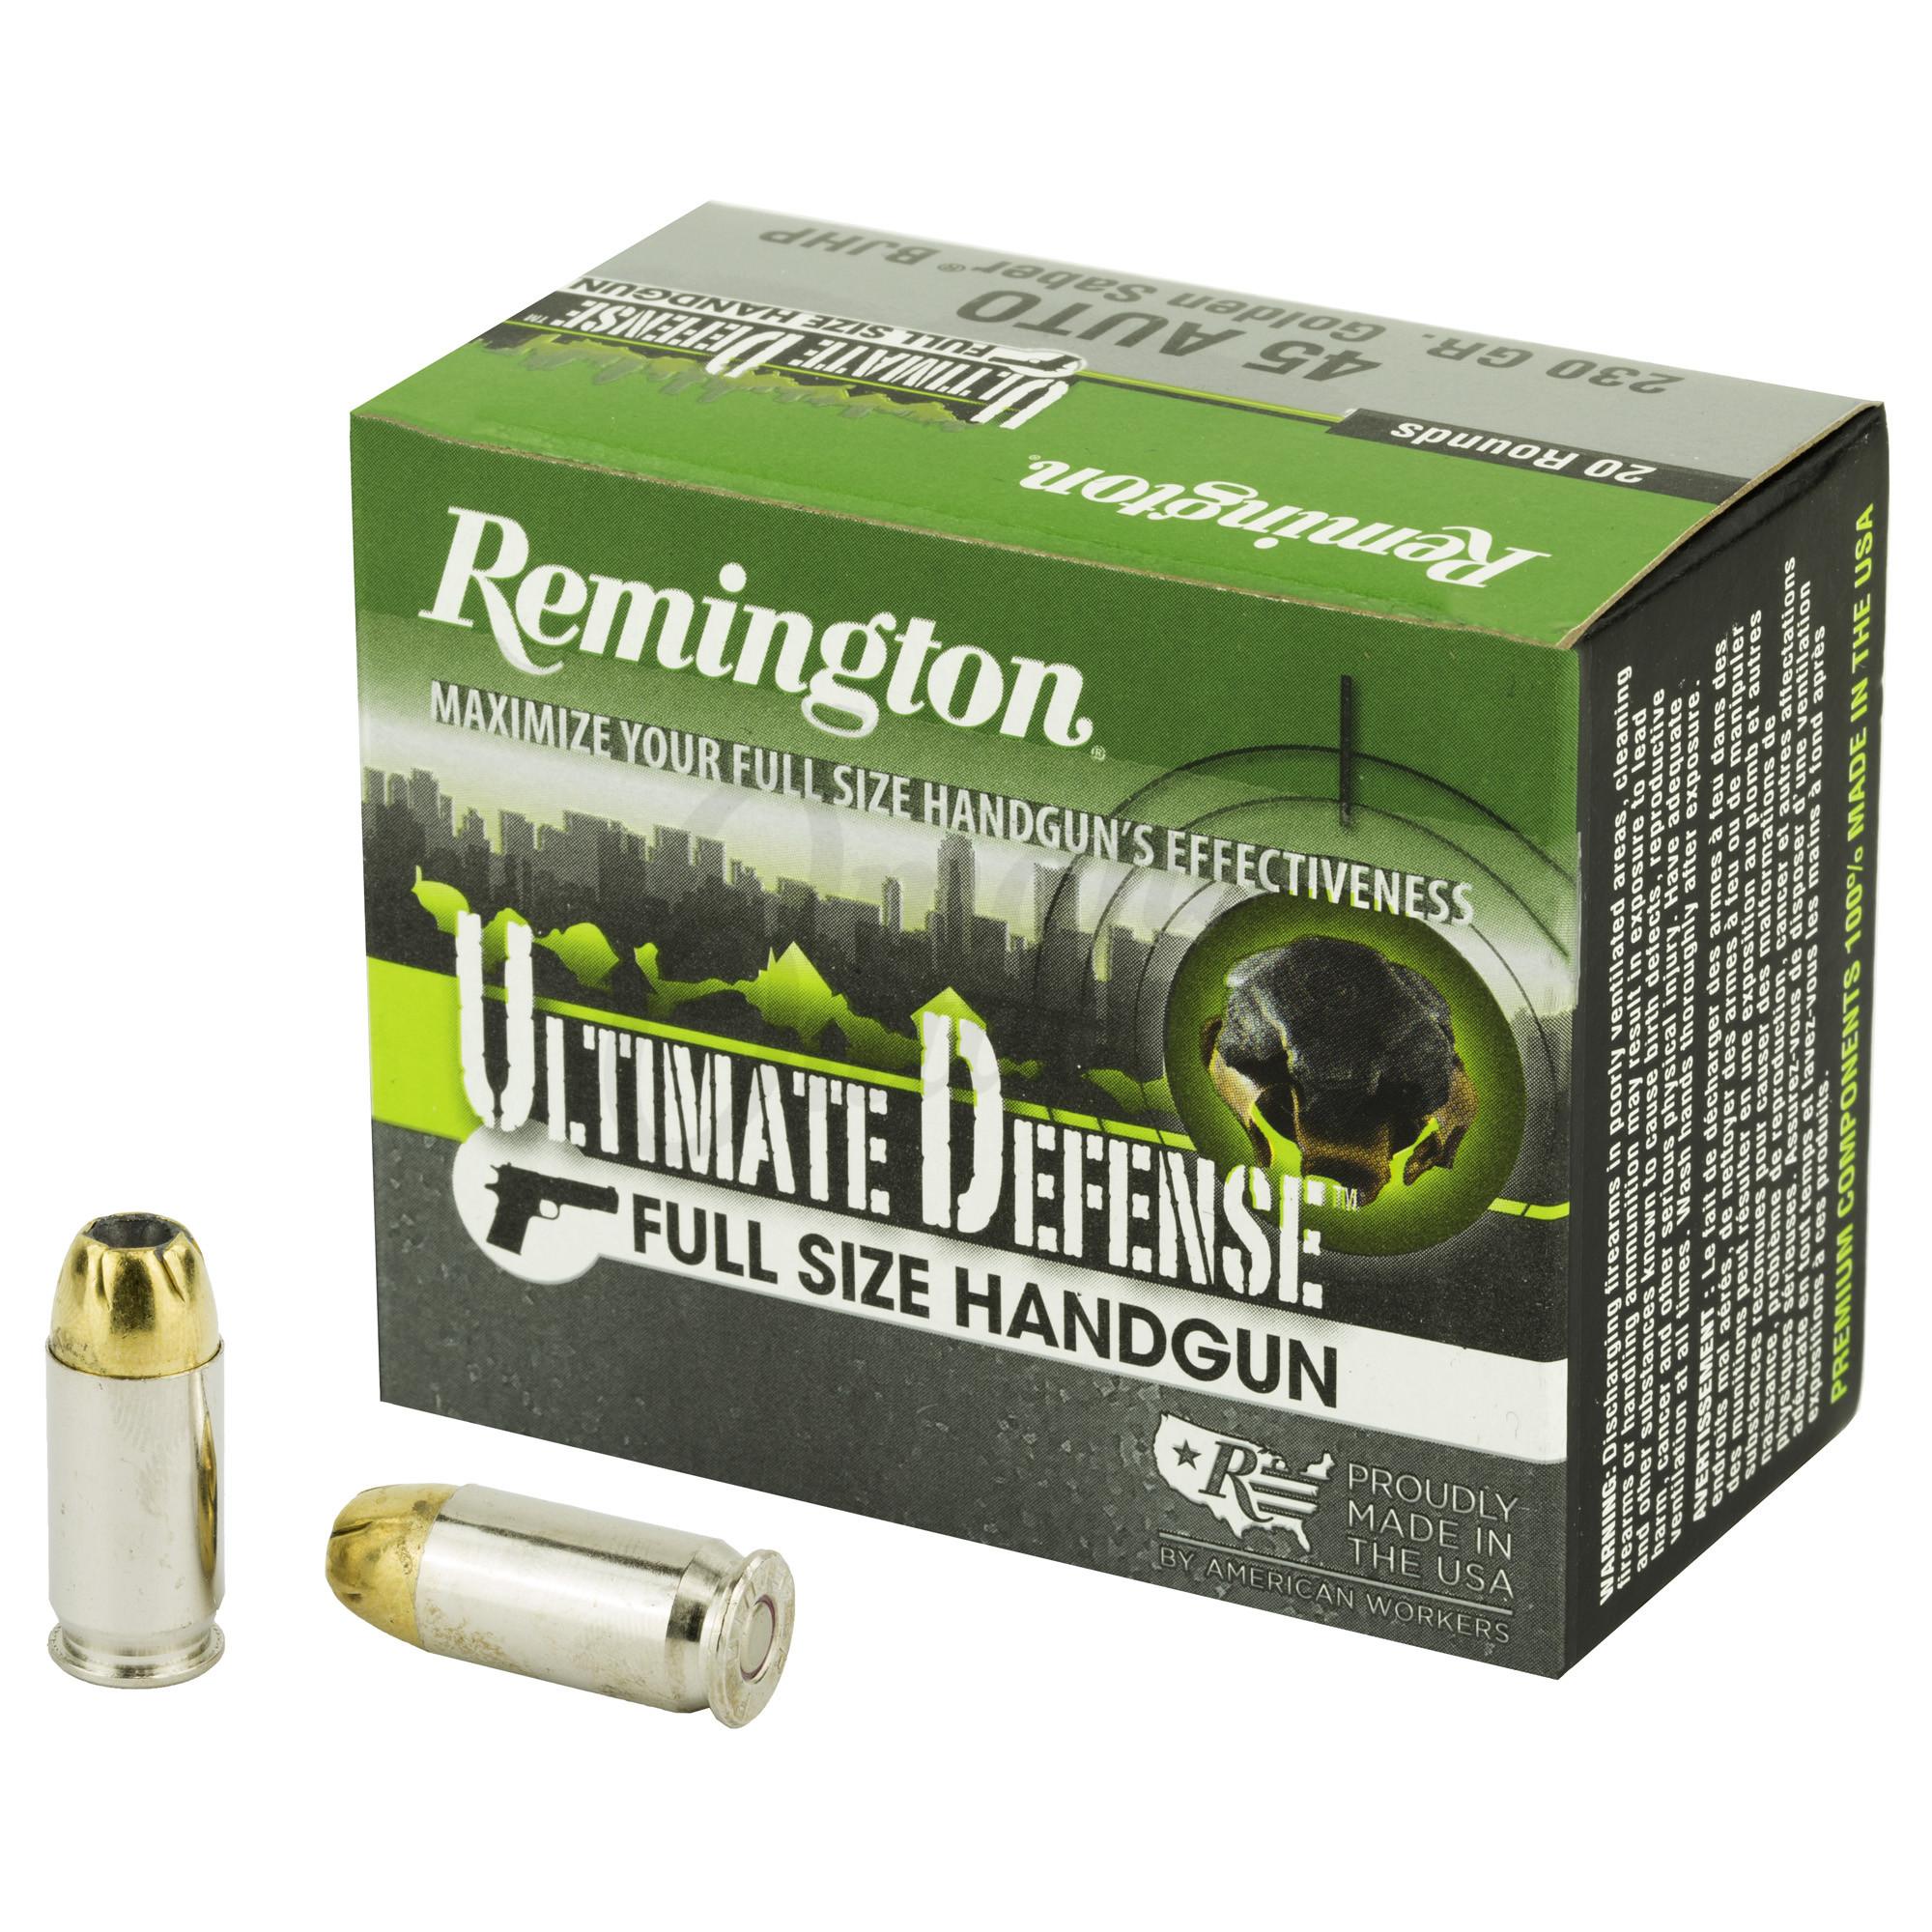 Remington Ultimate Defense 45 ACP Ammo 230 Grain Brass JHP 20 Round Box  28942